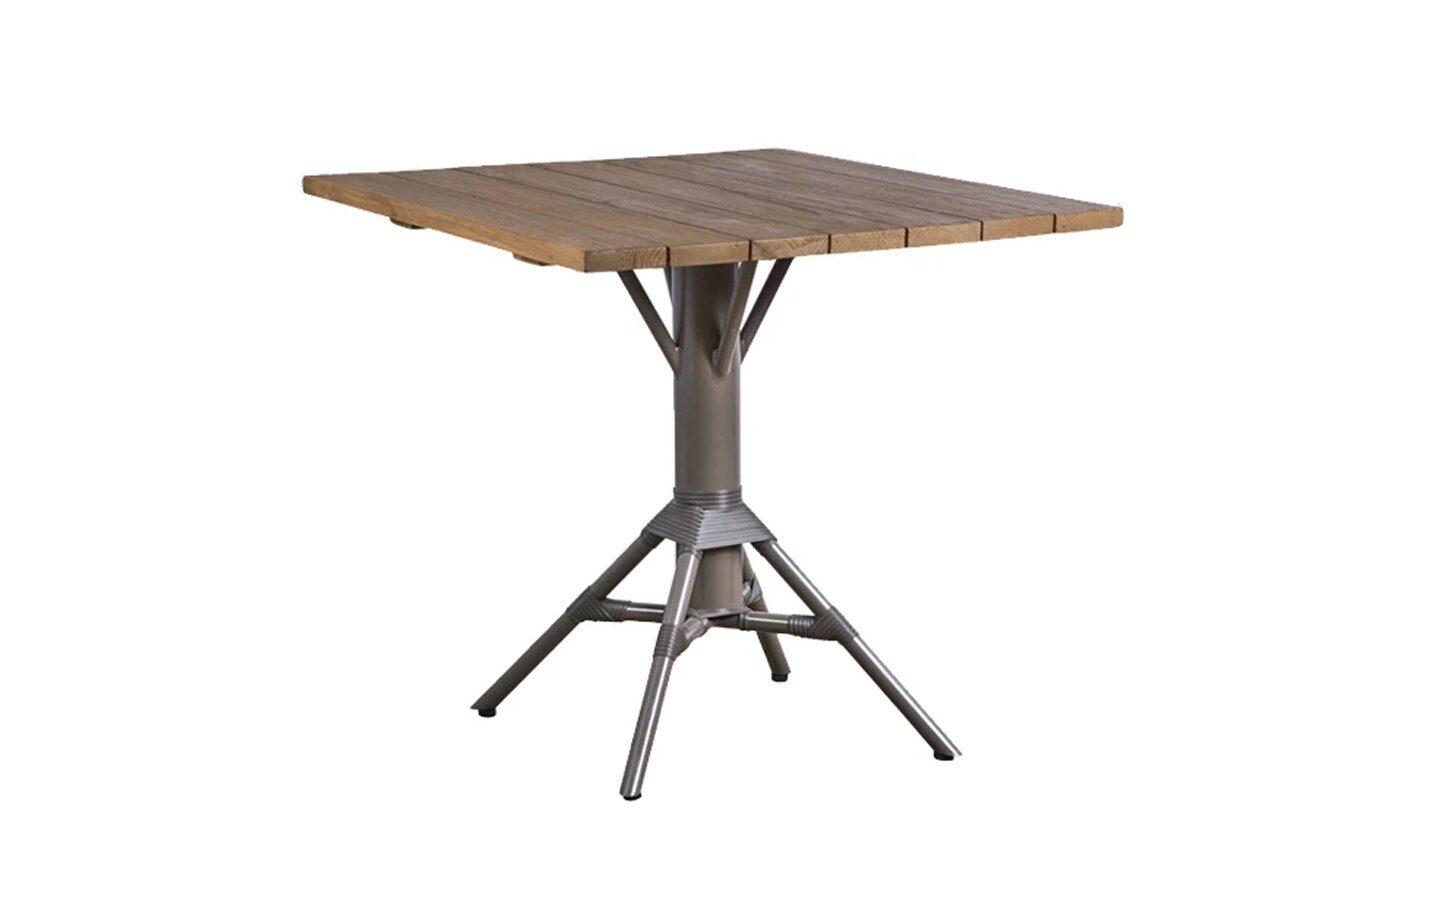 Nicole-Café-table-Taupe-color